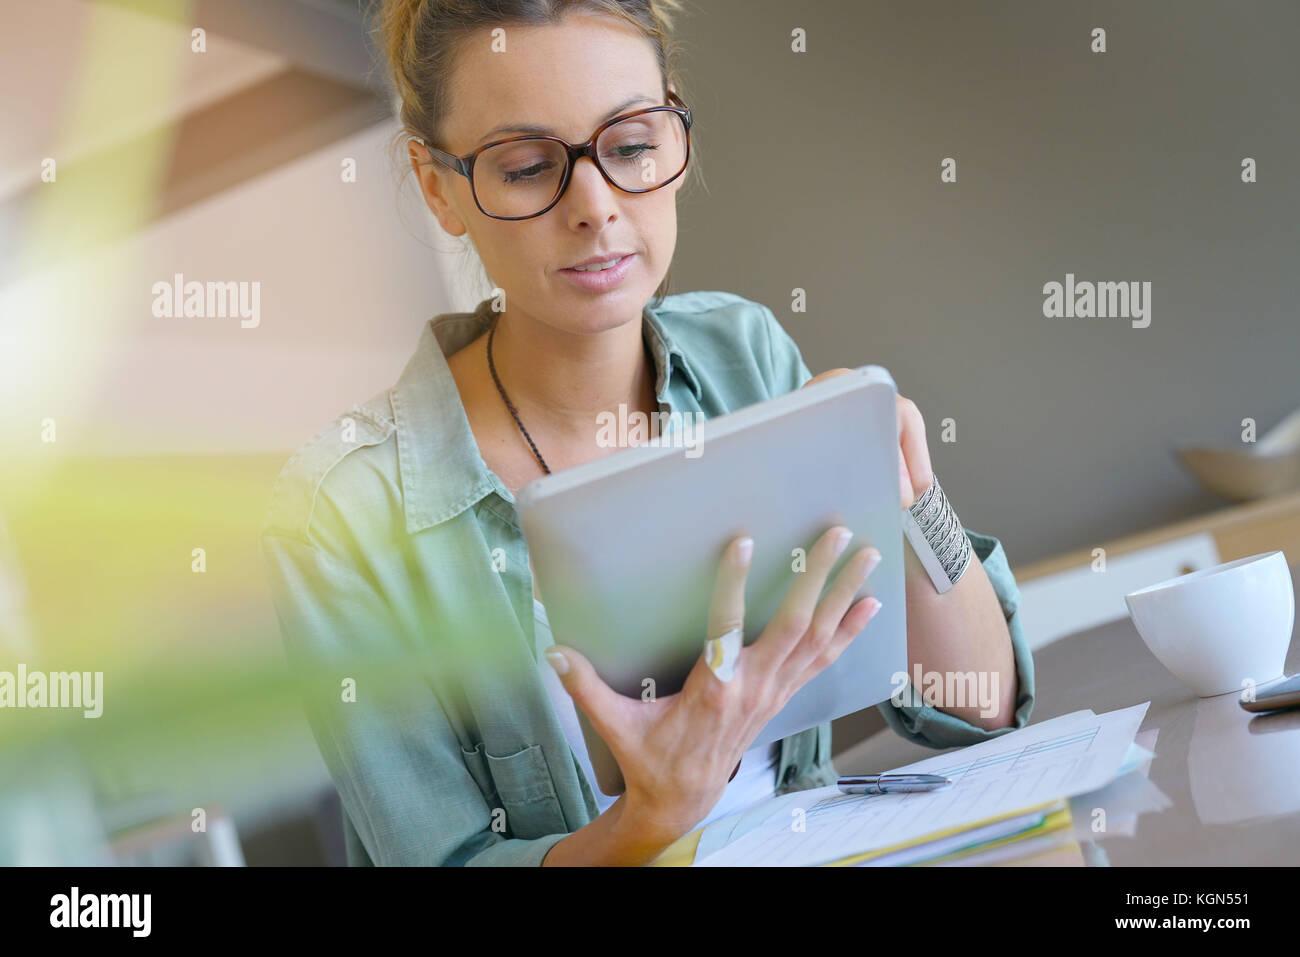 Trendy designer girl at home working on digital tablet - Stock Image